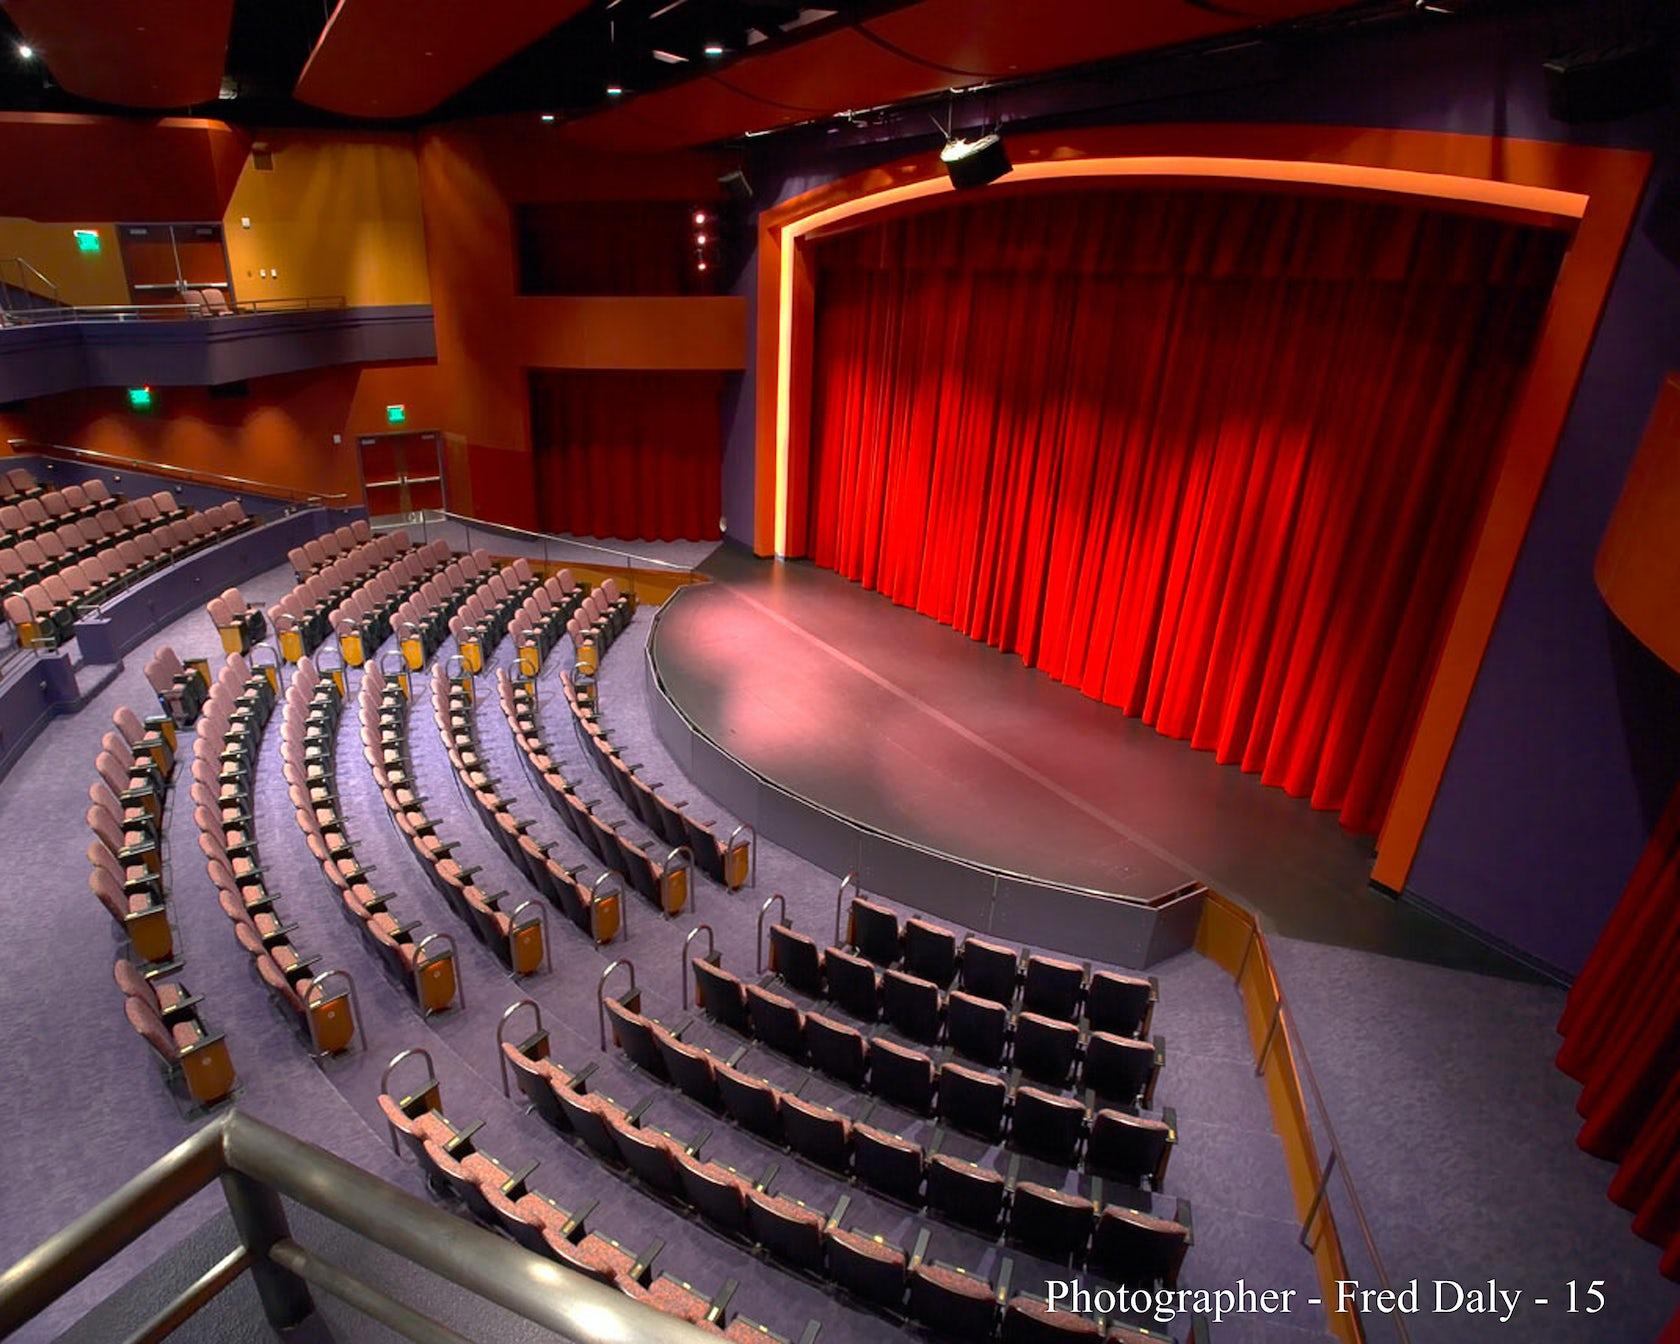 Victoria gardens cultural center architizer for Victoria gardens movie theater